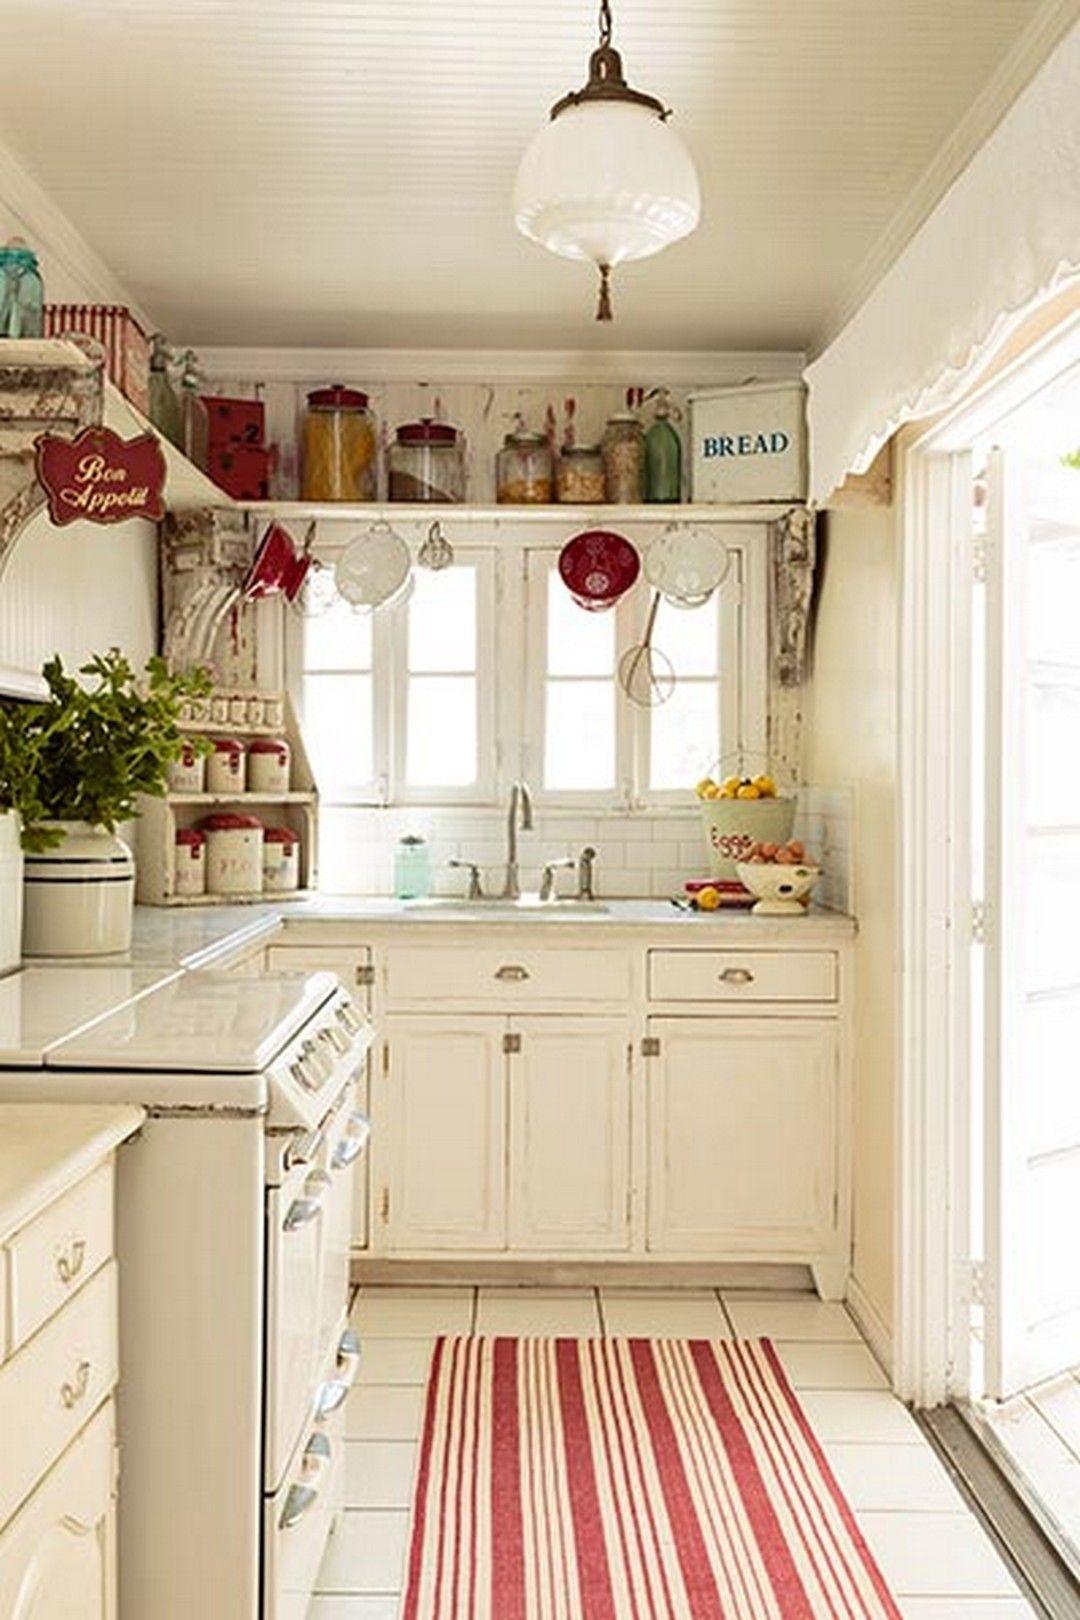 100 cozy and cool cottage style interior design cottage kitchens kitchen remodel kitchen decor on kitchen interior accessories id=63575